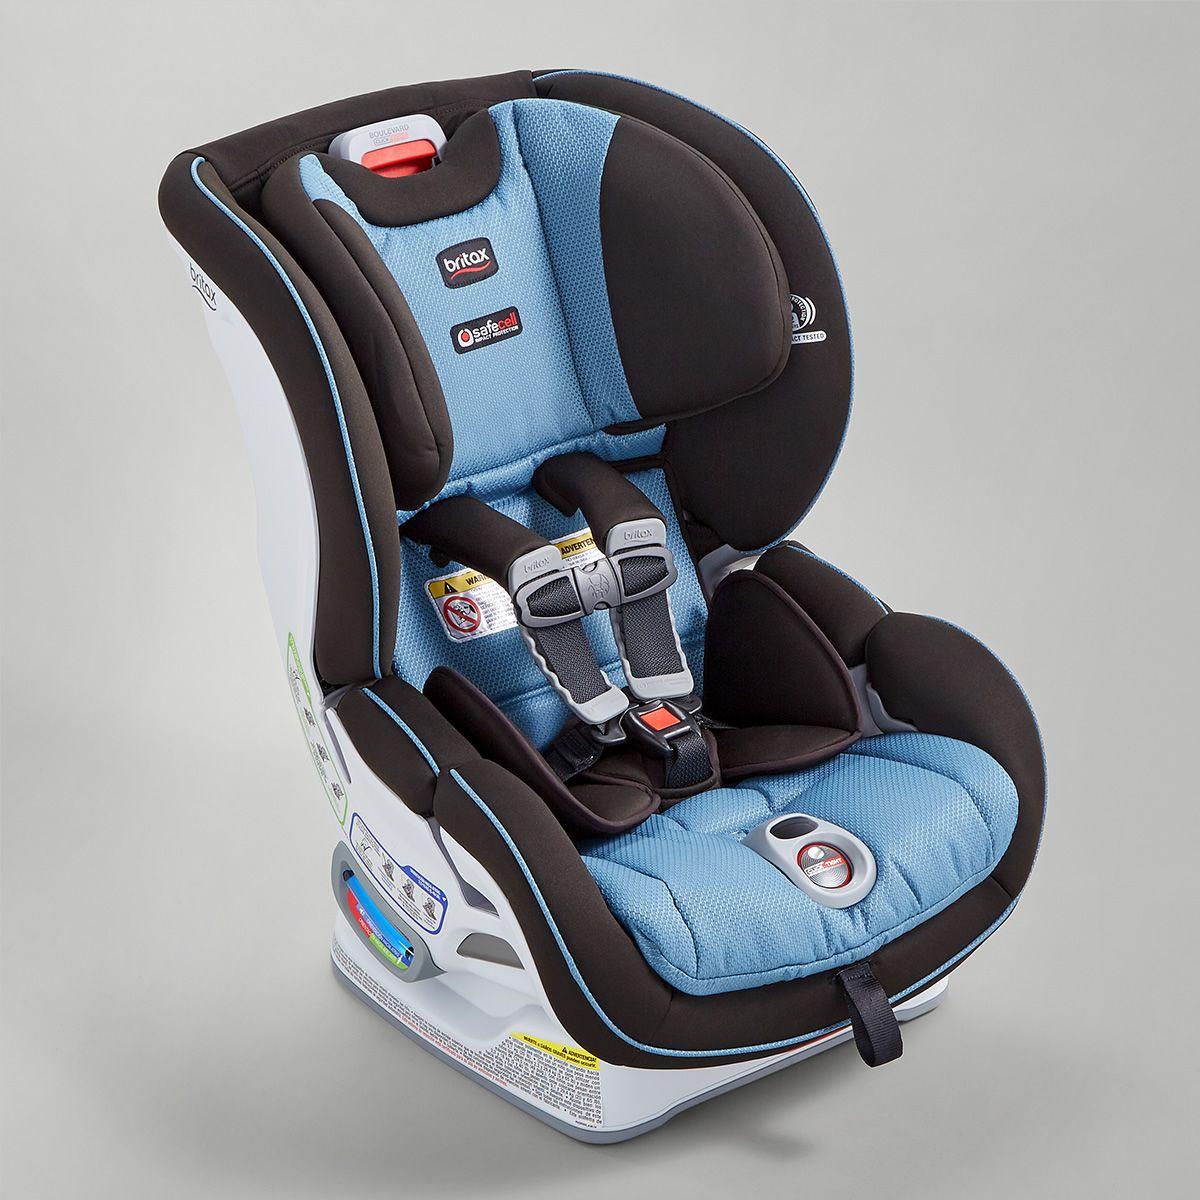 Baby Travel